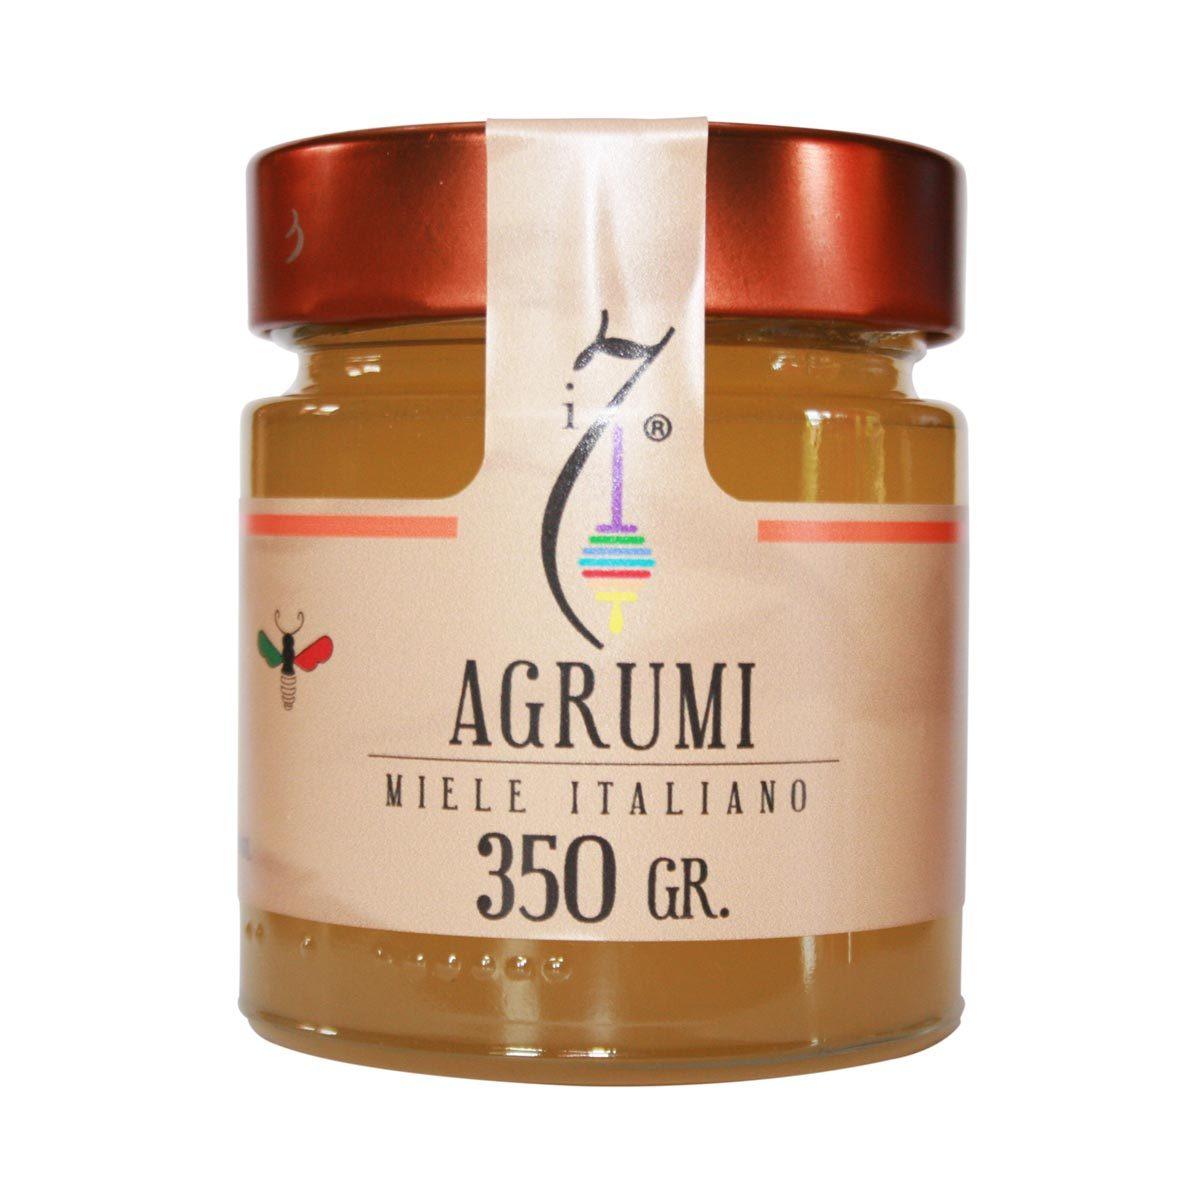 Miele di Agrumi i7 350 gr